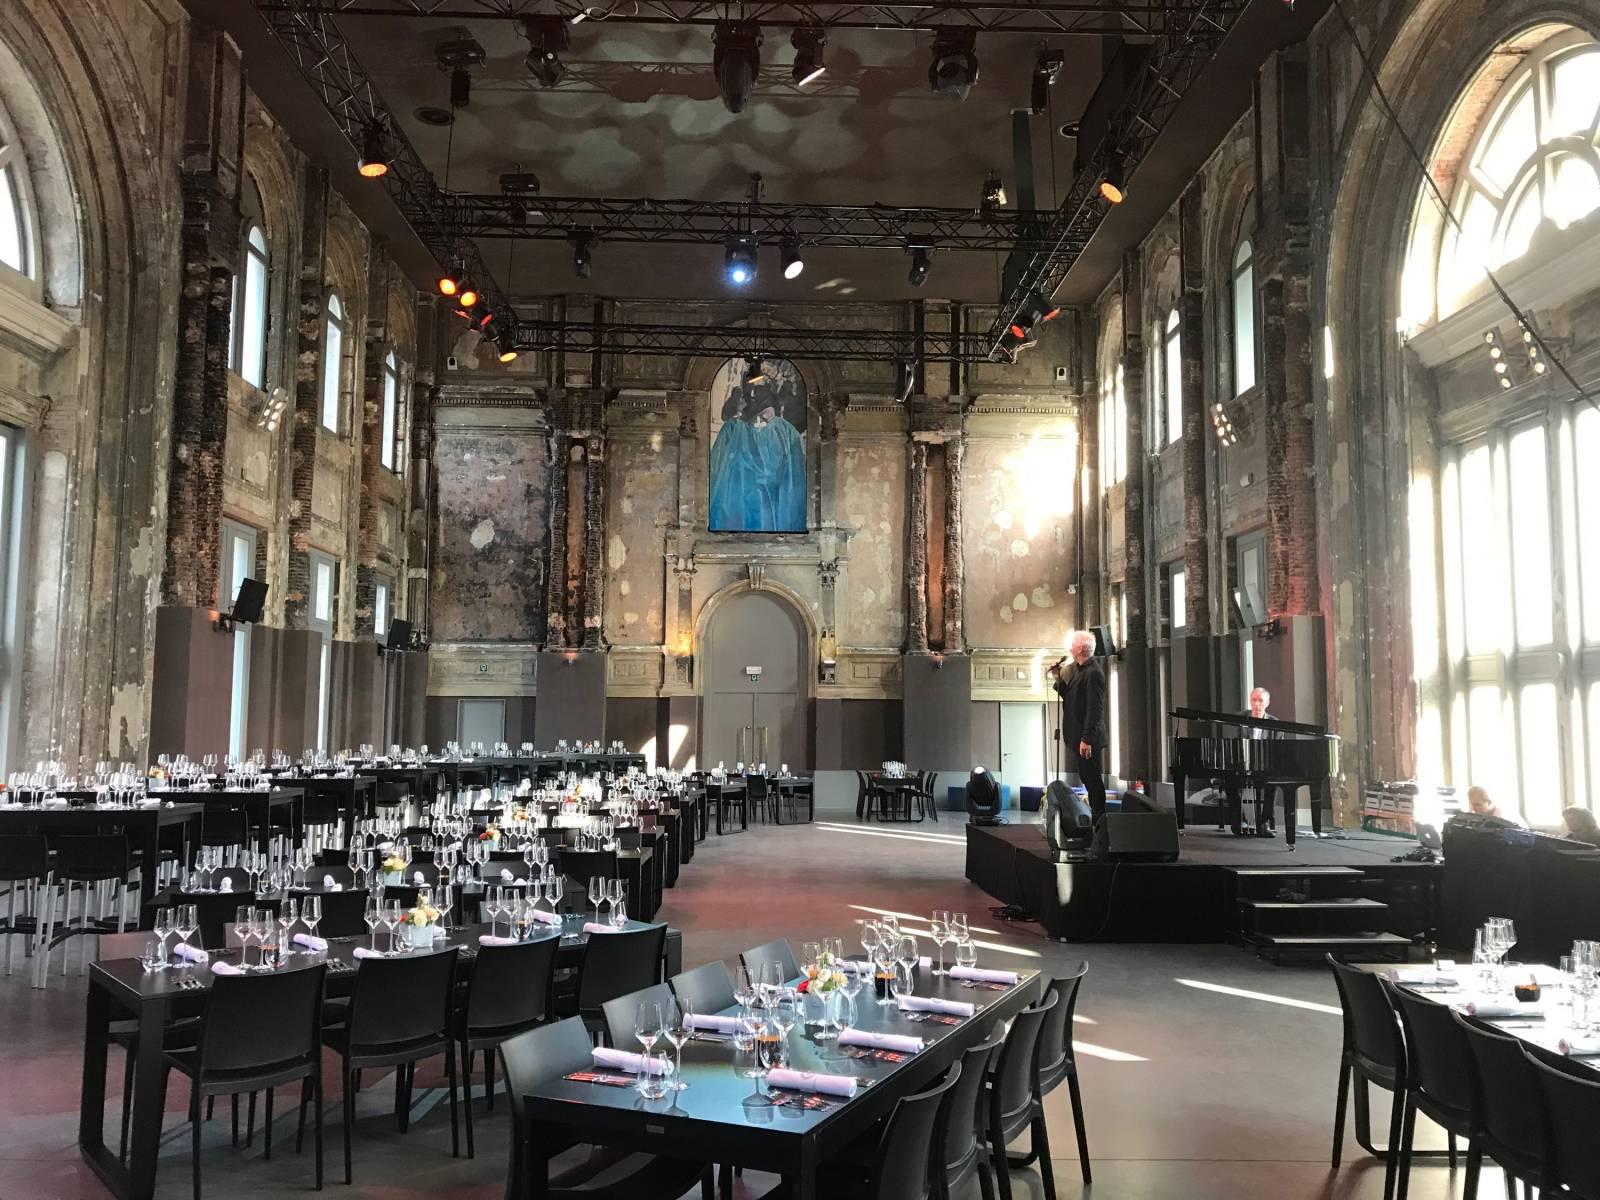 Zaal AthenA - Feestzaal - Trouwzaal - Antwerpen - House of Weddings - 41